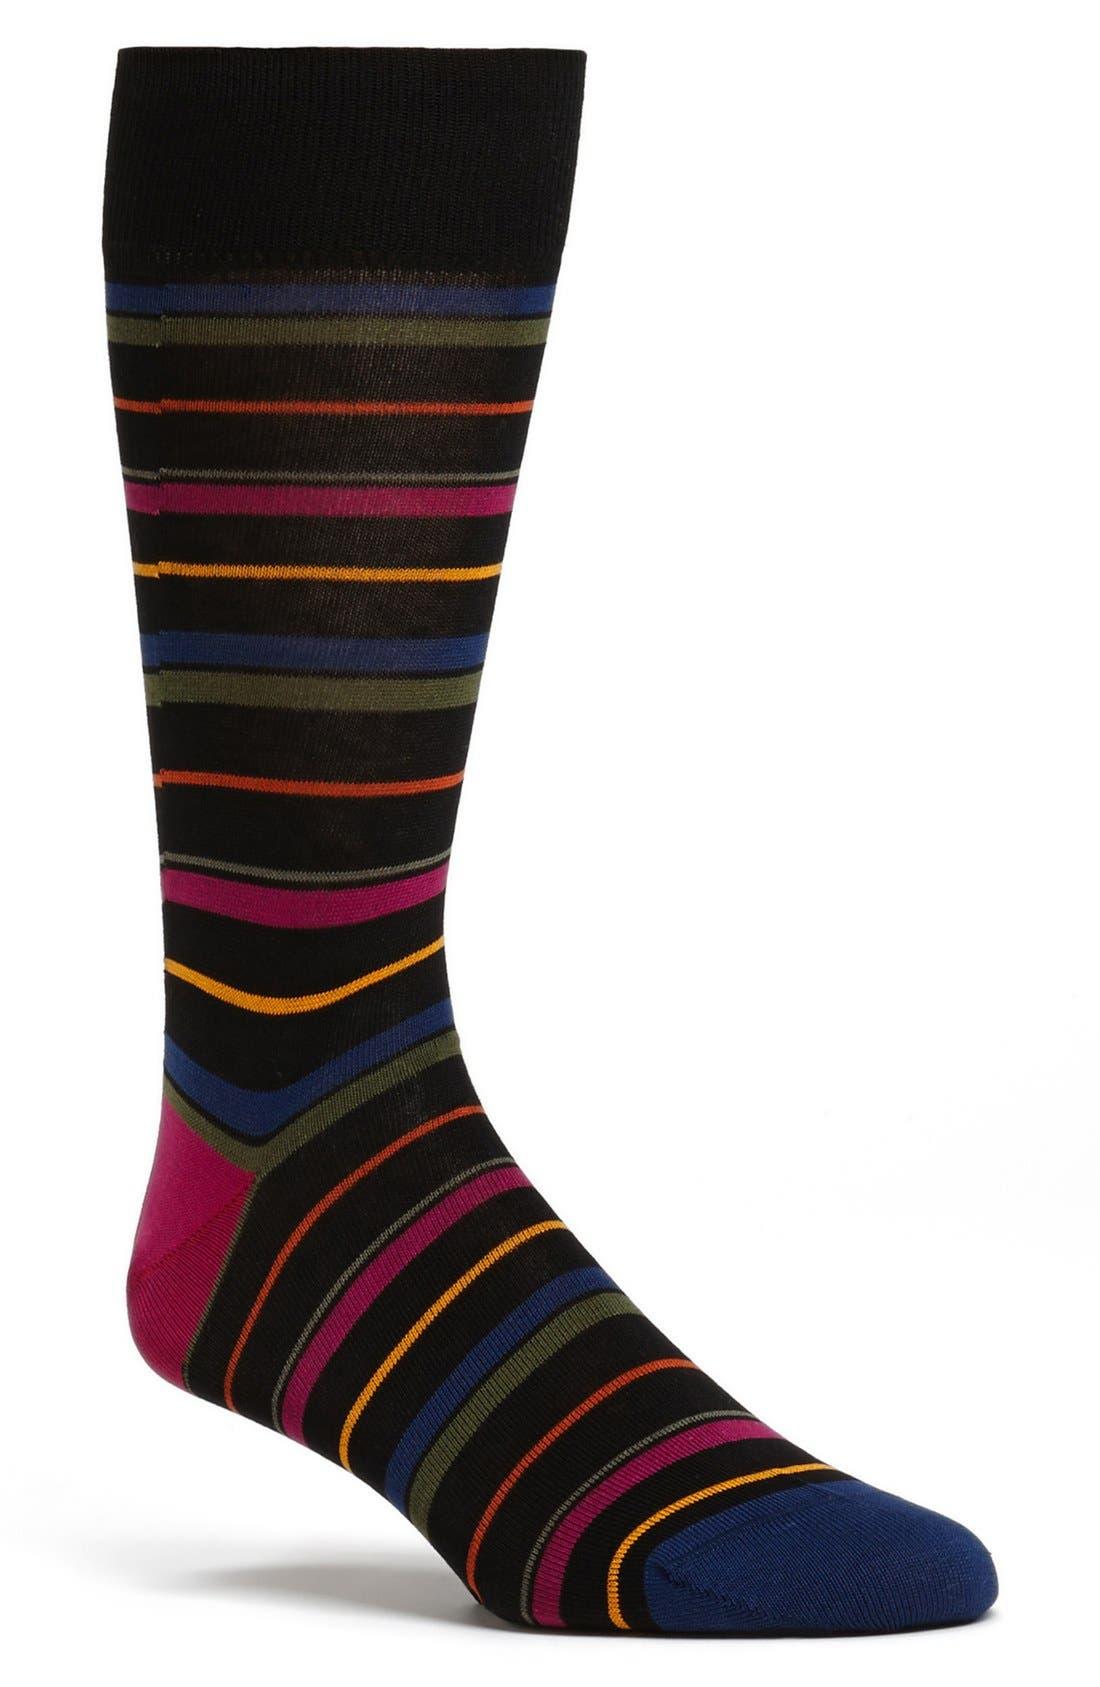 Alternate Image 1 Selected - Bugatchi Stripe Mercerized Cotton Blend Socks